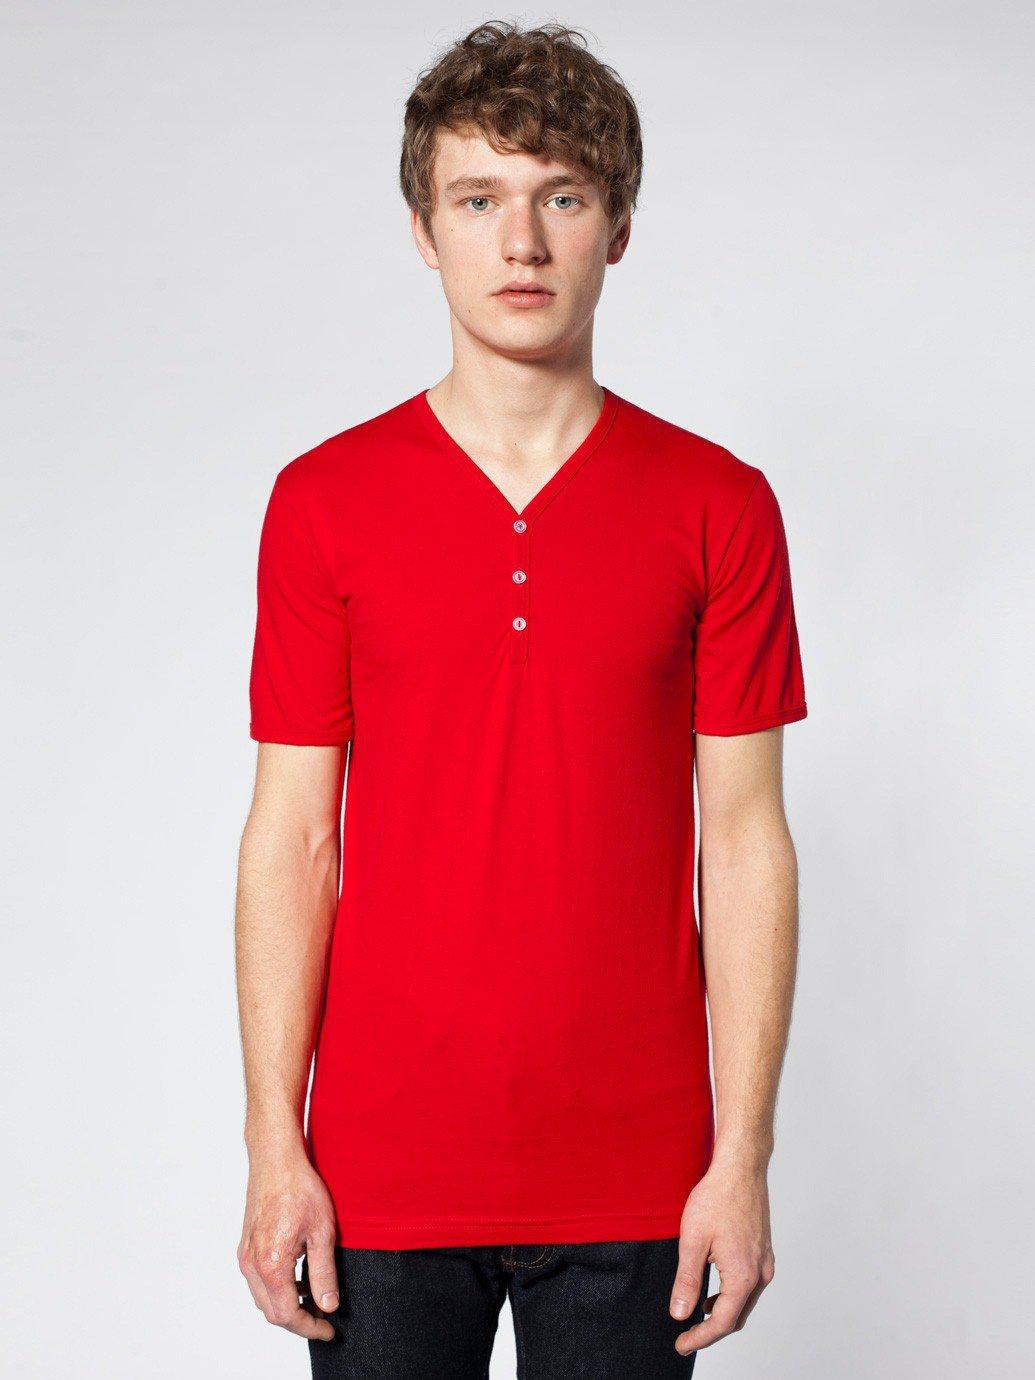 82033fc11a American Apparel Fine Jersey Short Sleeve Henley - Evan Webster INK